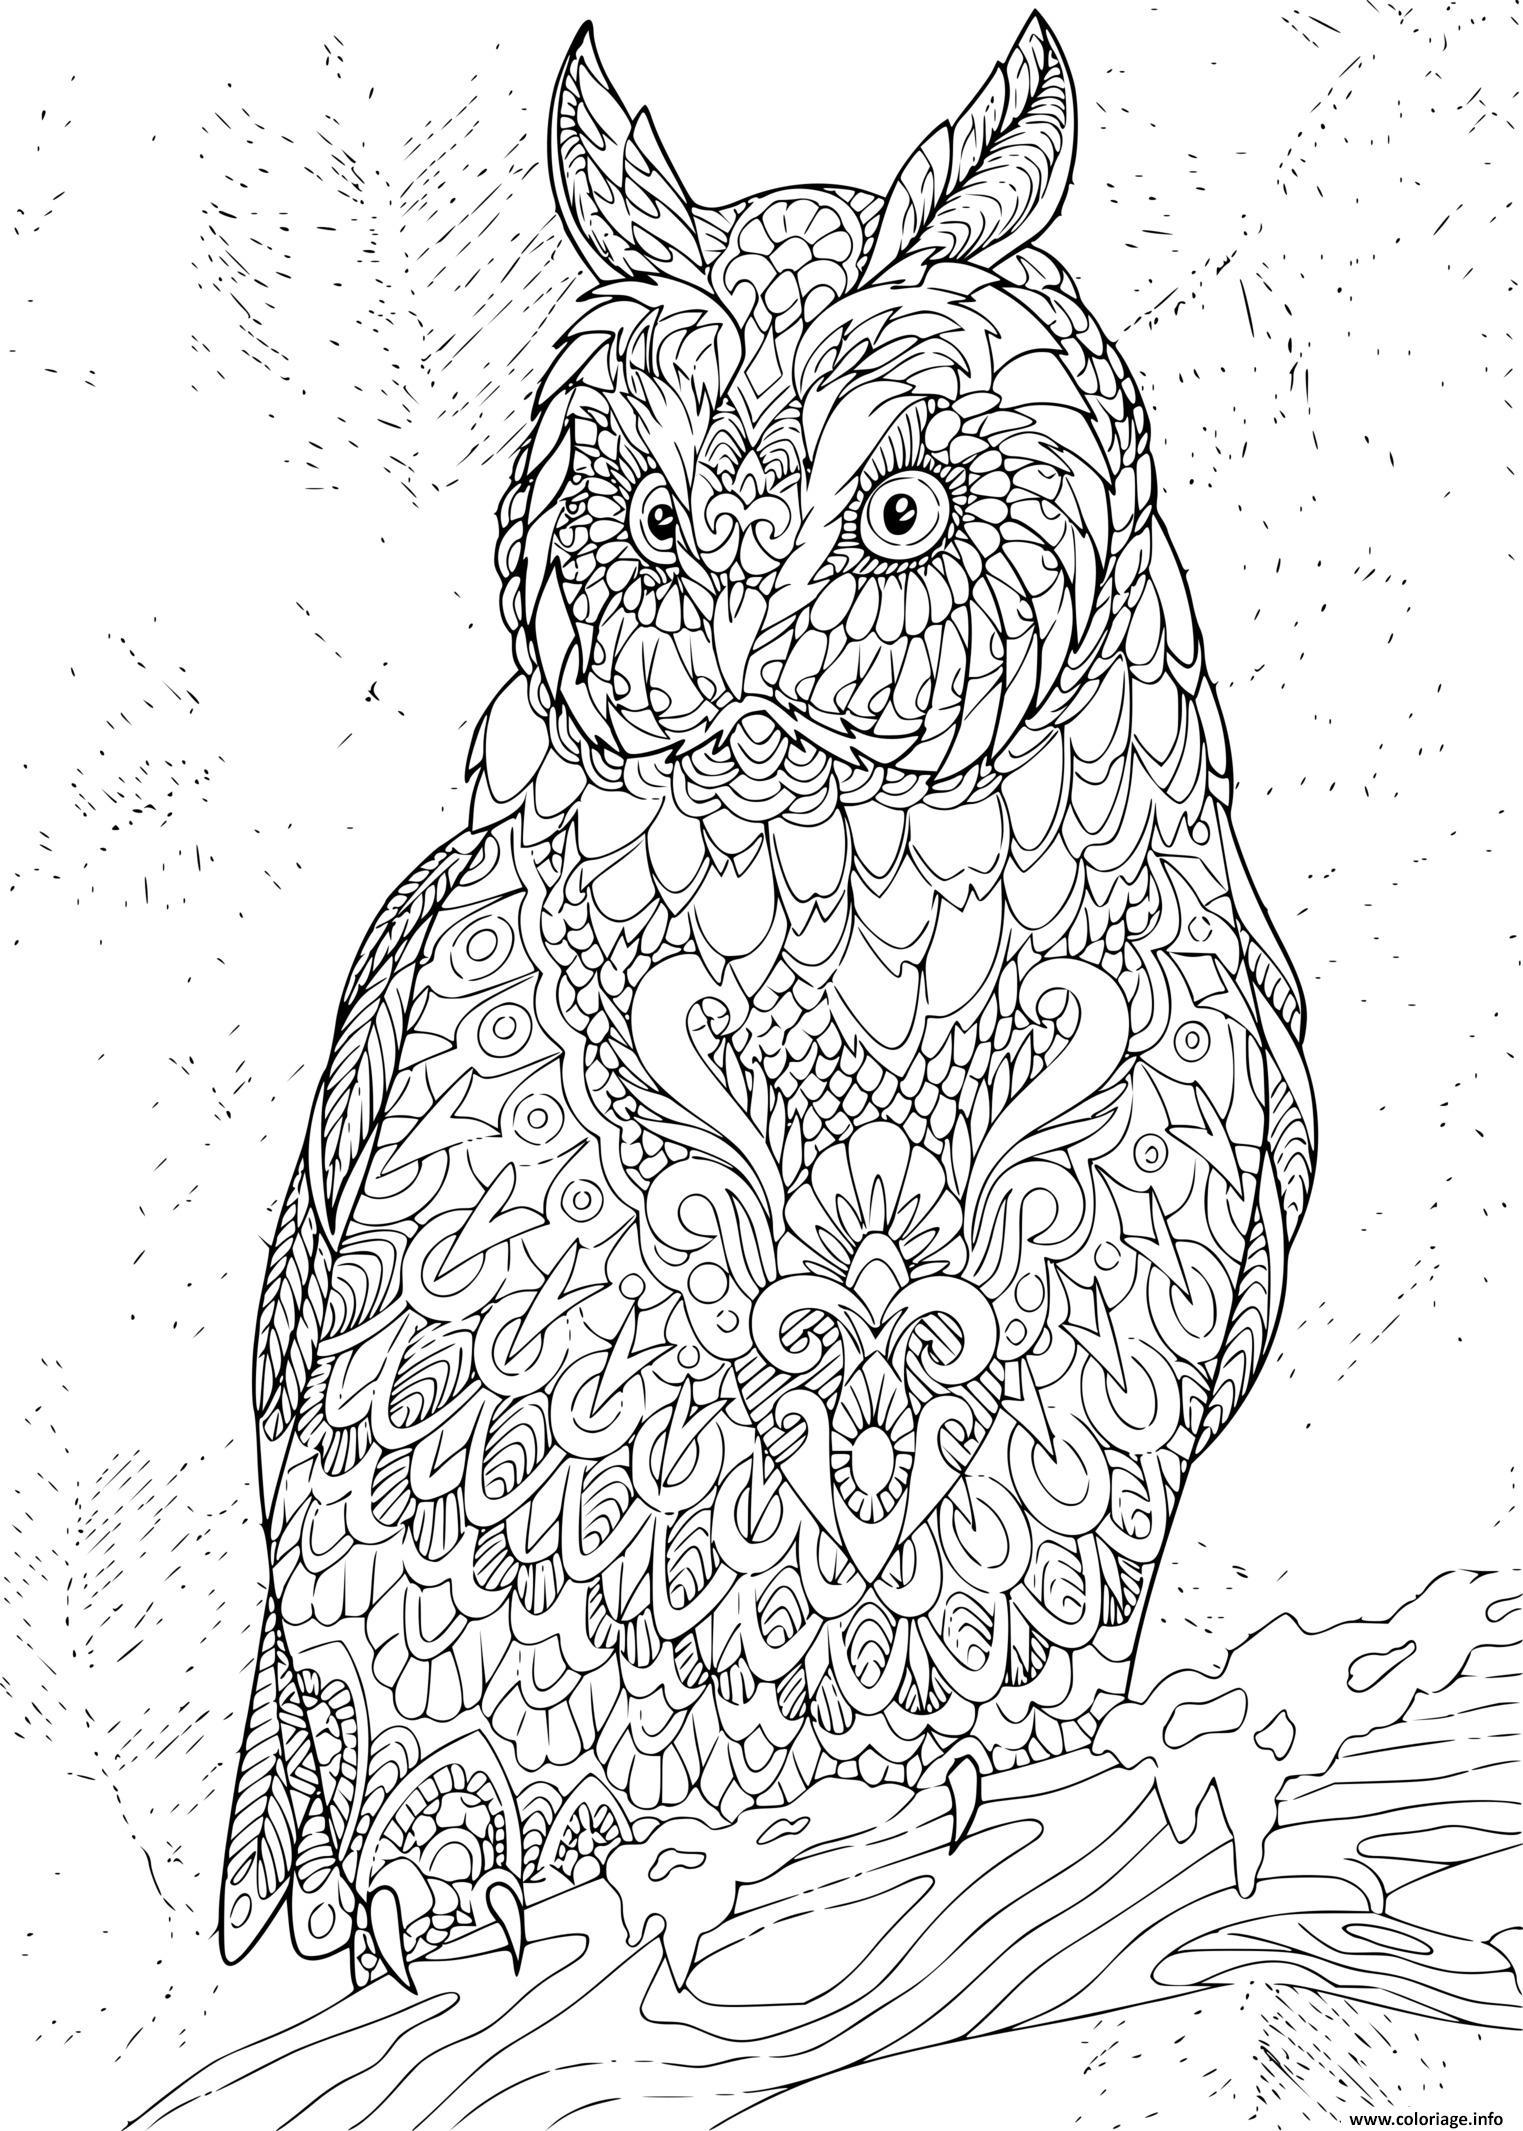 Dessin zentangle eagle owl Coloriage Gratuit à Imprimer